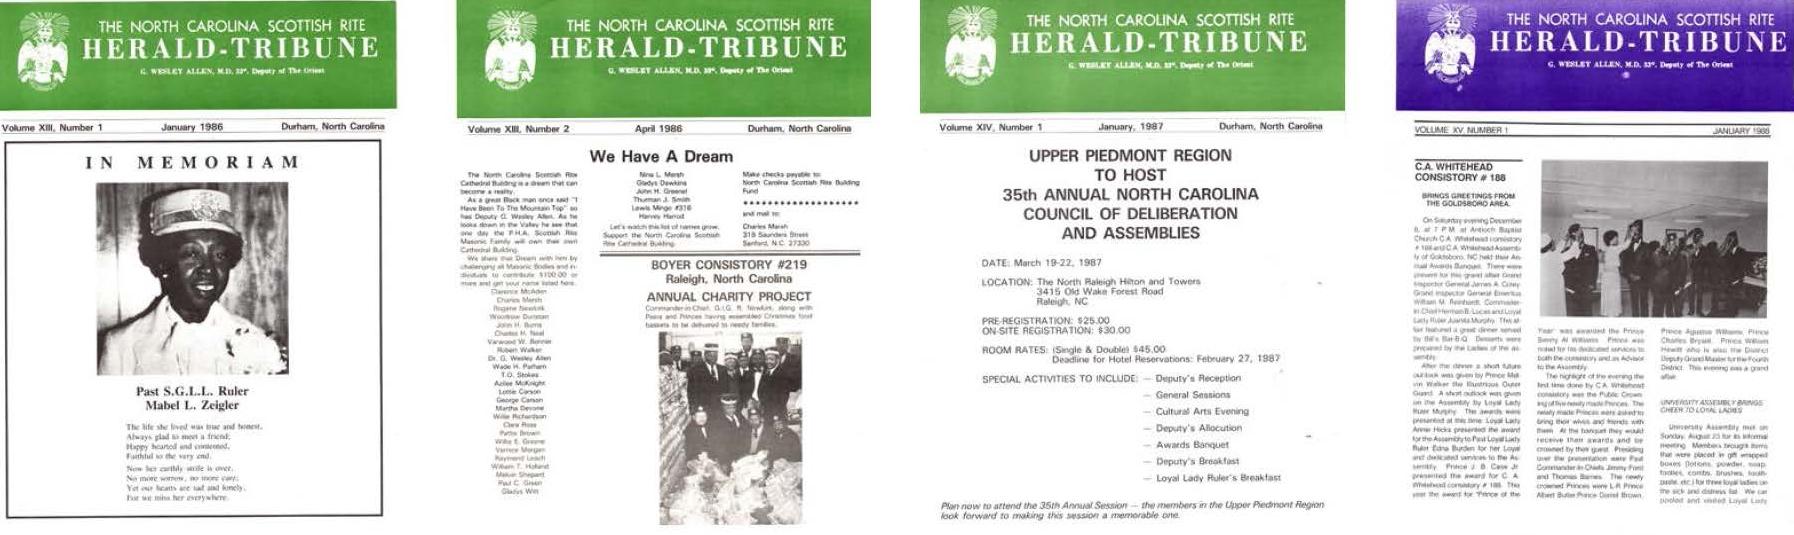 Herald Tribune set 2 of 4